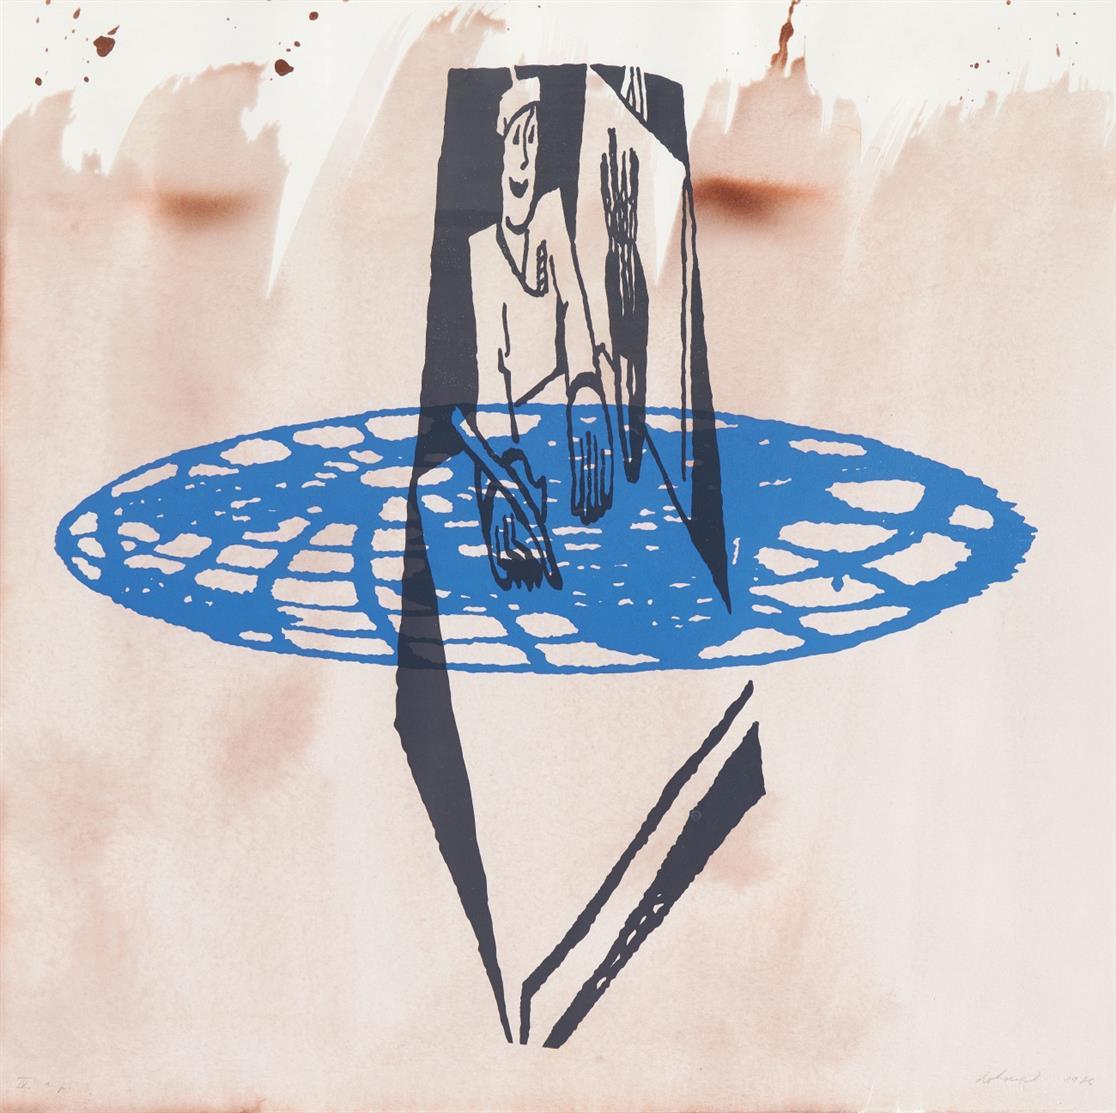 Jiri Georg Dokoupil. Ohne Titel. 1986. Farbserigraphie über Aquarell. Signiert. Ex. IV a.p.